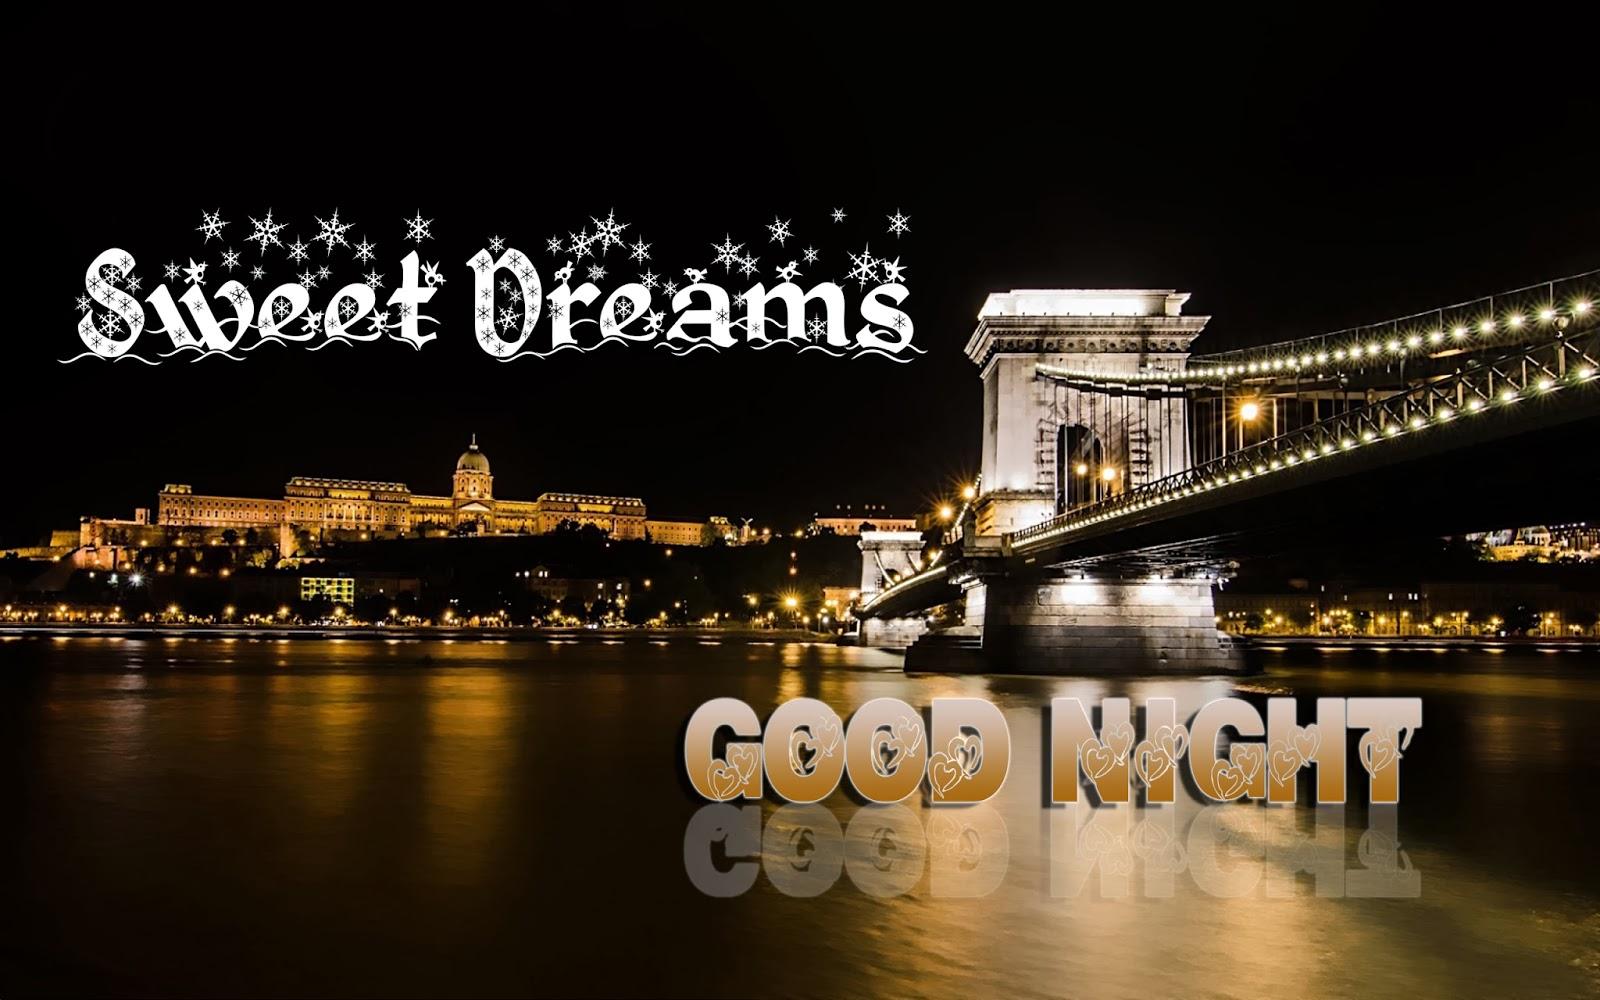 Good-Night-Sweet-Dreams-Image-HD-Wide